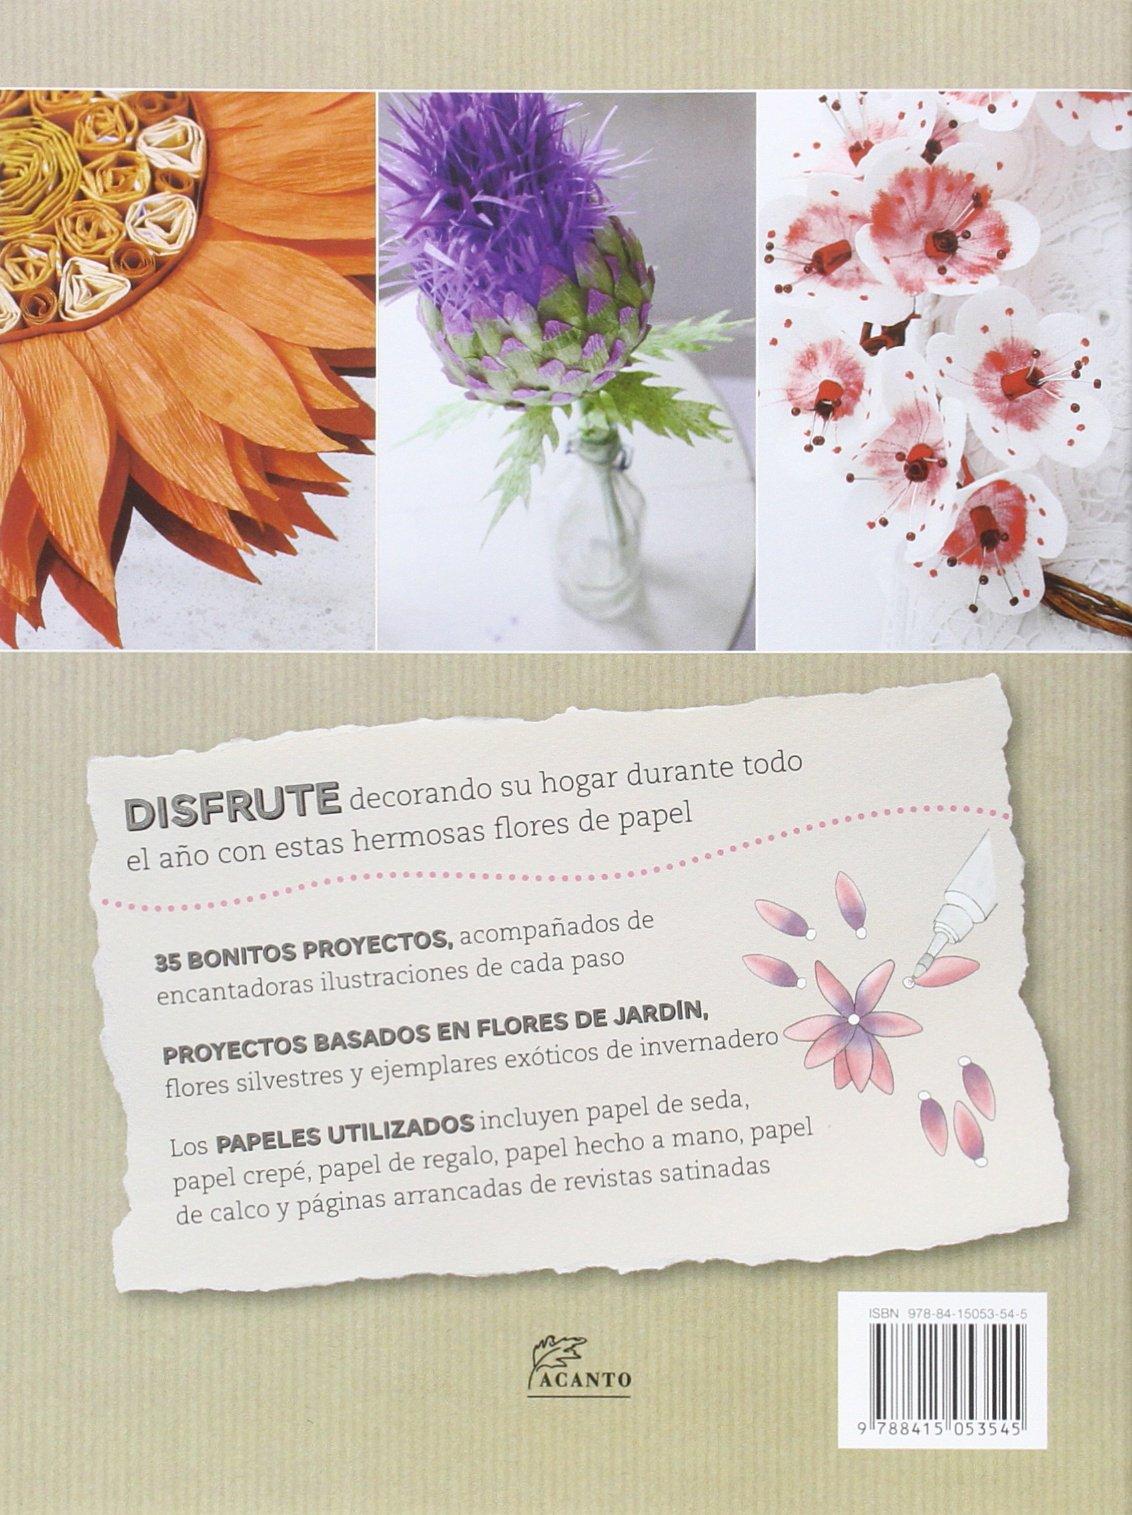 Flores de papel: 35 Bonitos proyectos paso a paso: Amazon.es: Denise Brown, Gerardo Di Masso Sabolo: Libros